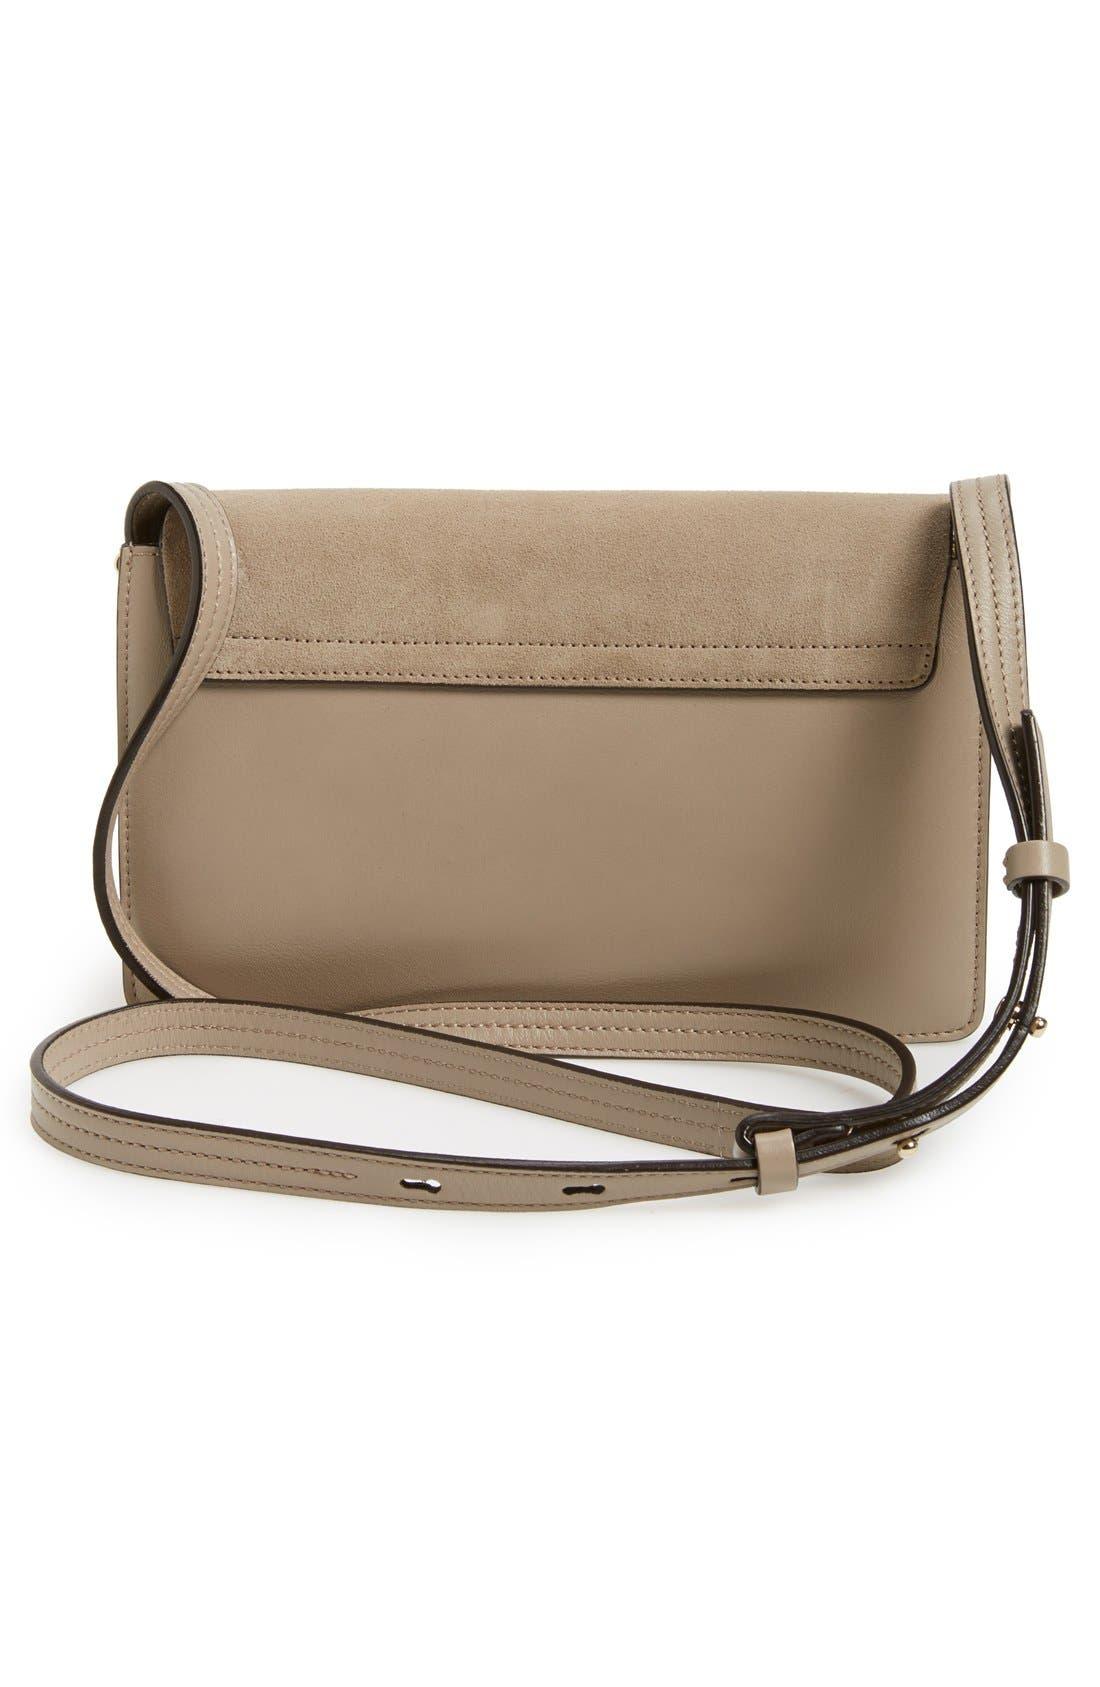 Alternate Image 3  - Chloé Small Faye Leather Shoulder Bag